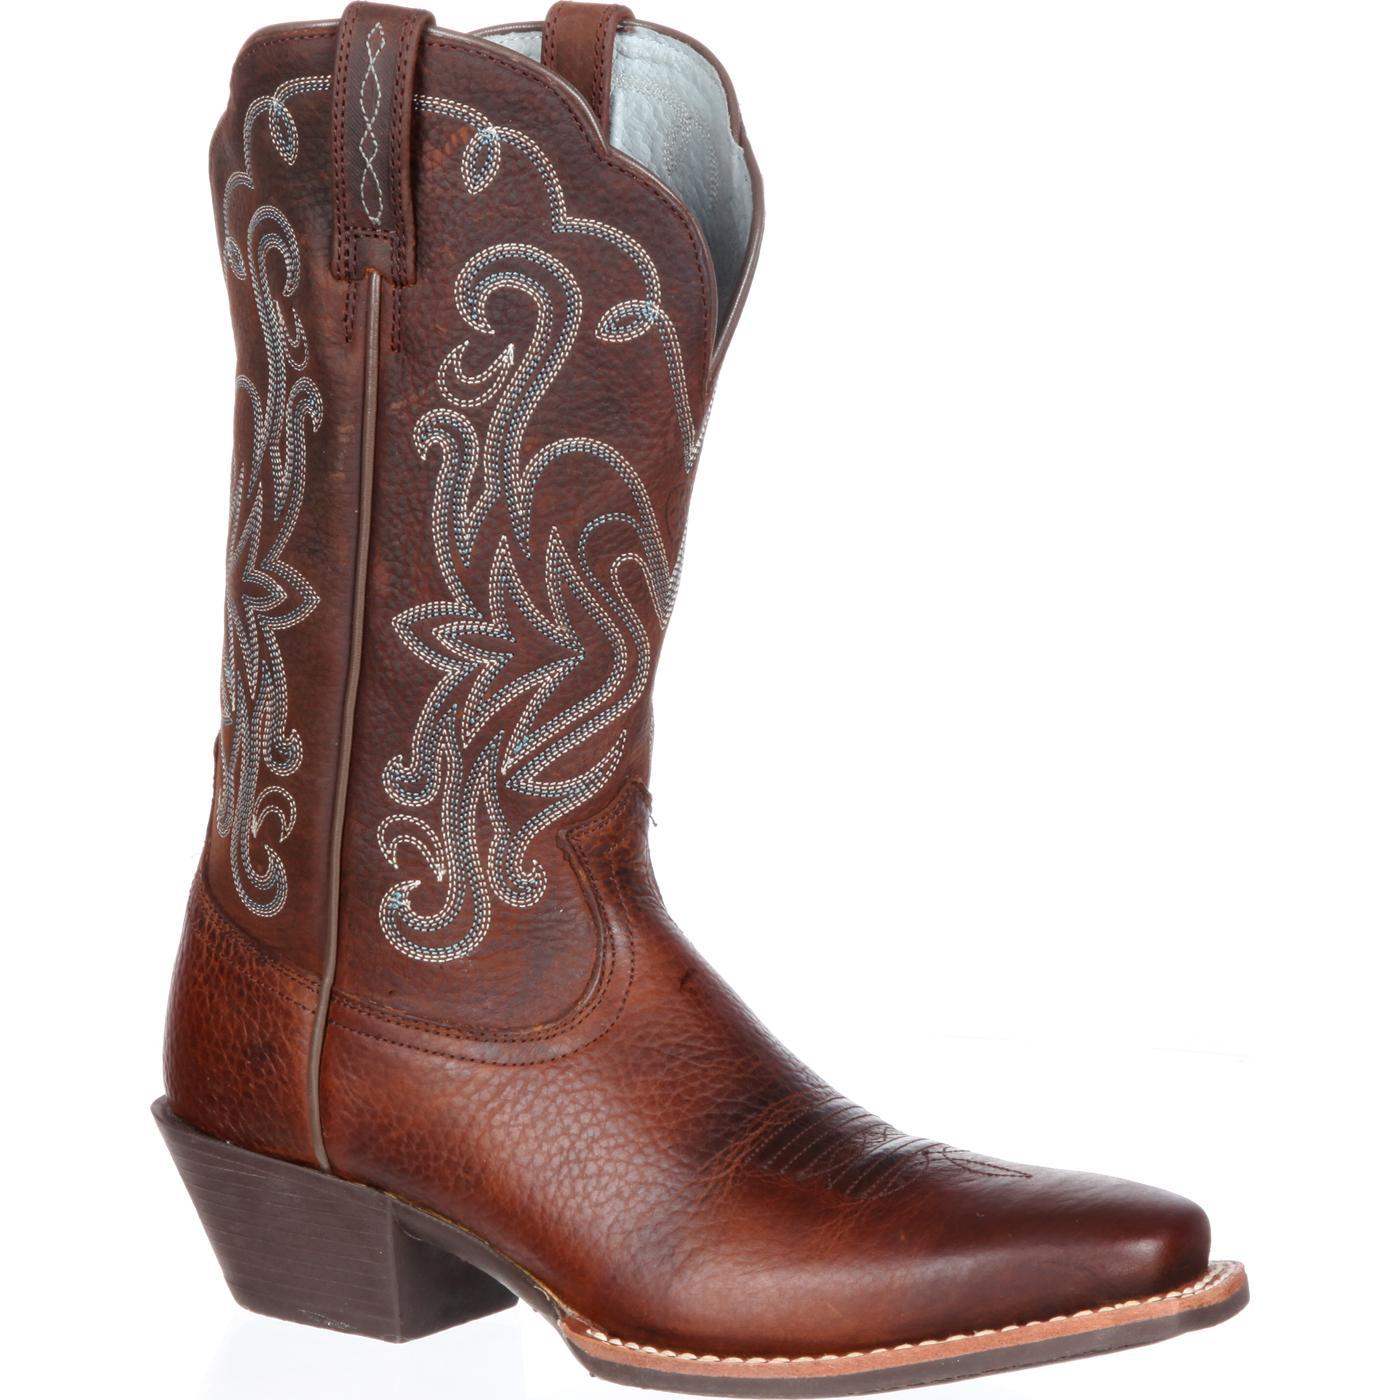 ac5a0eefc75 Ariat Legend Women's Western Boot